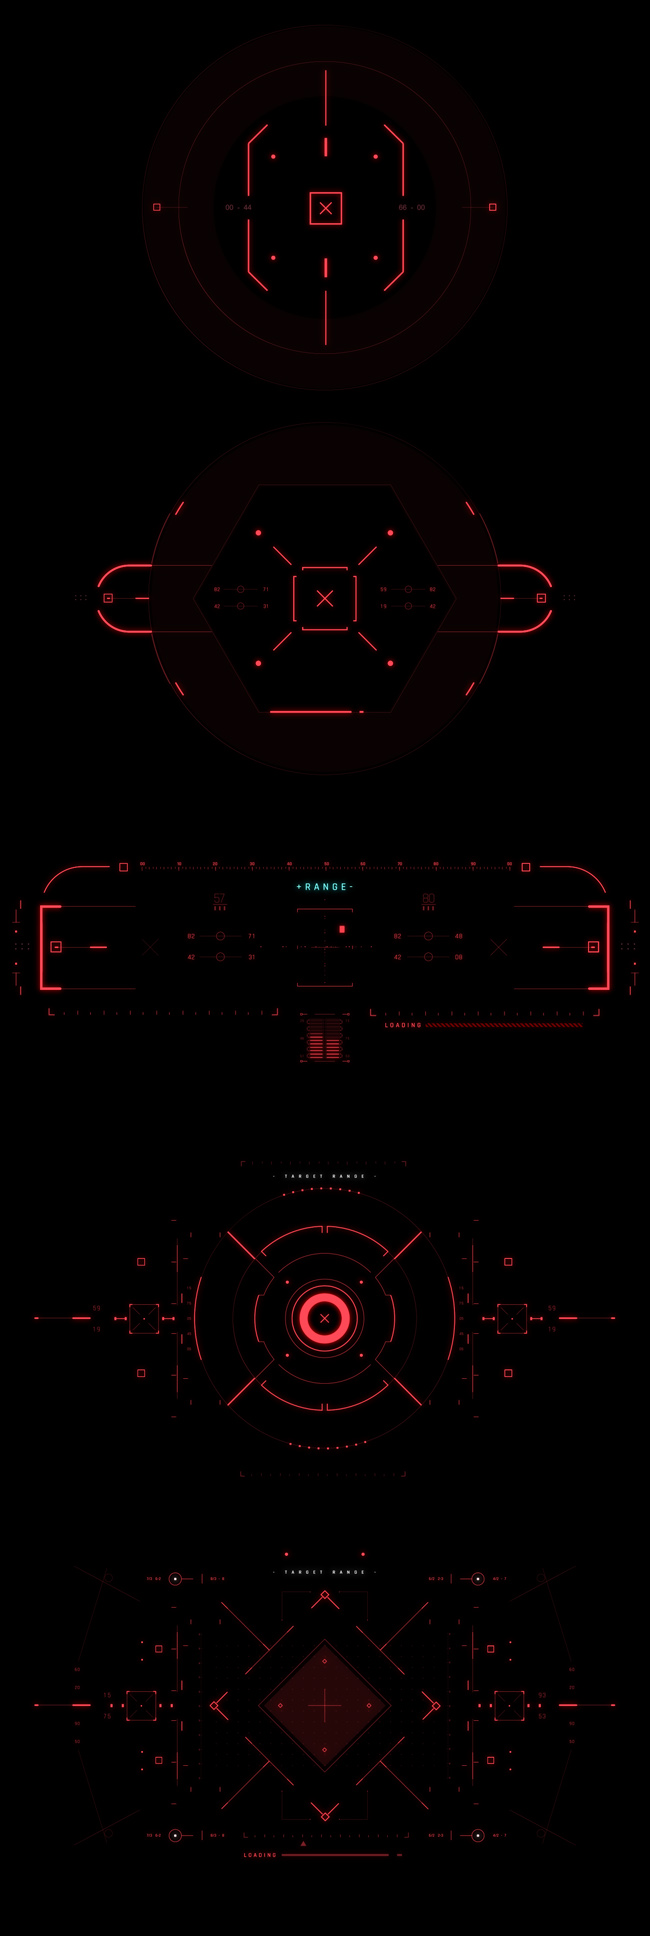 AE脚本-500个HUD高科技赛博朋克UI科幻界面元素动画预设包 Cyberpunk HUD UI 500+ 已修复中文版AE表达式报错插图9